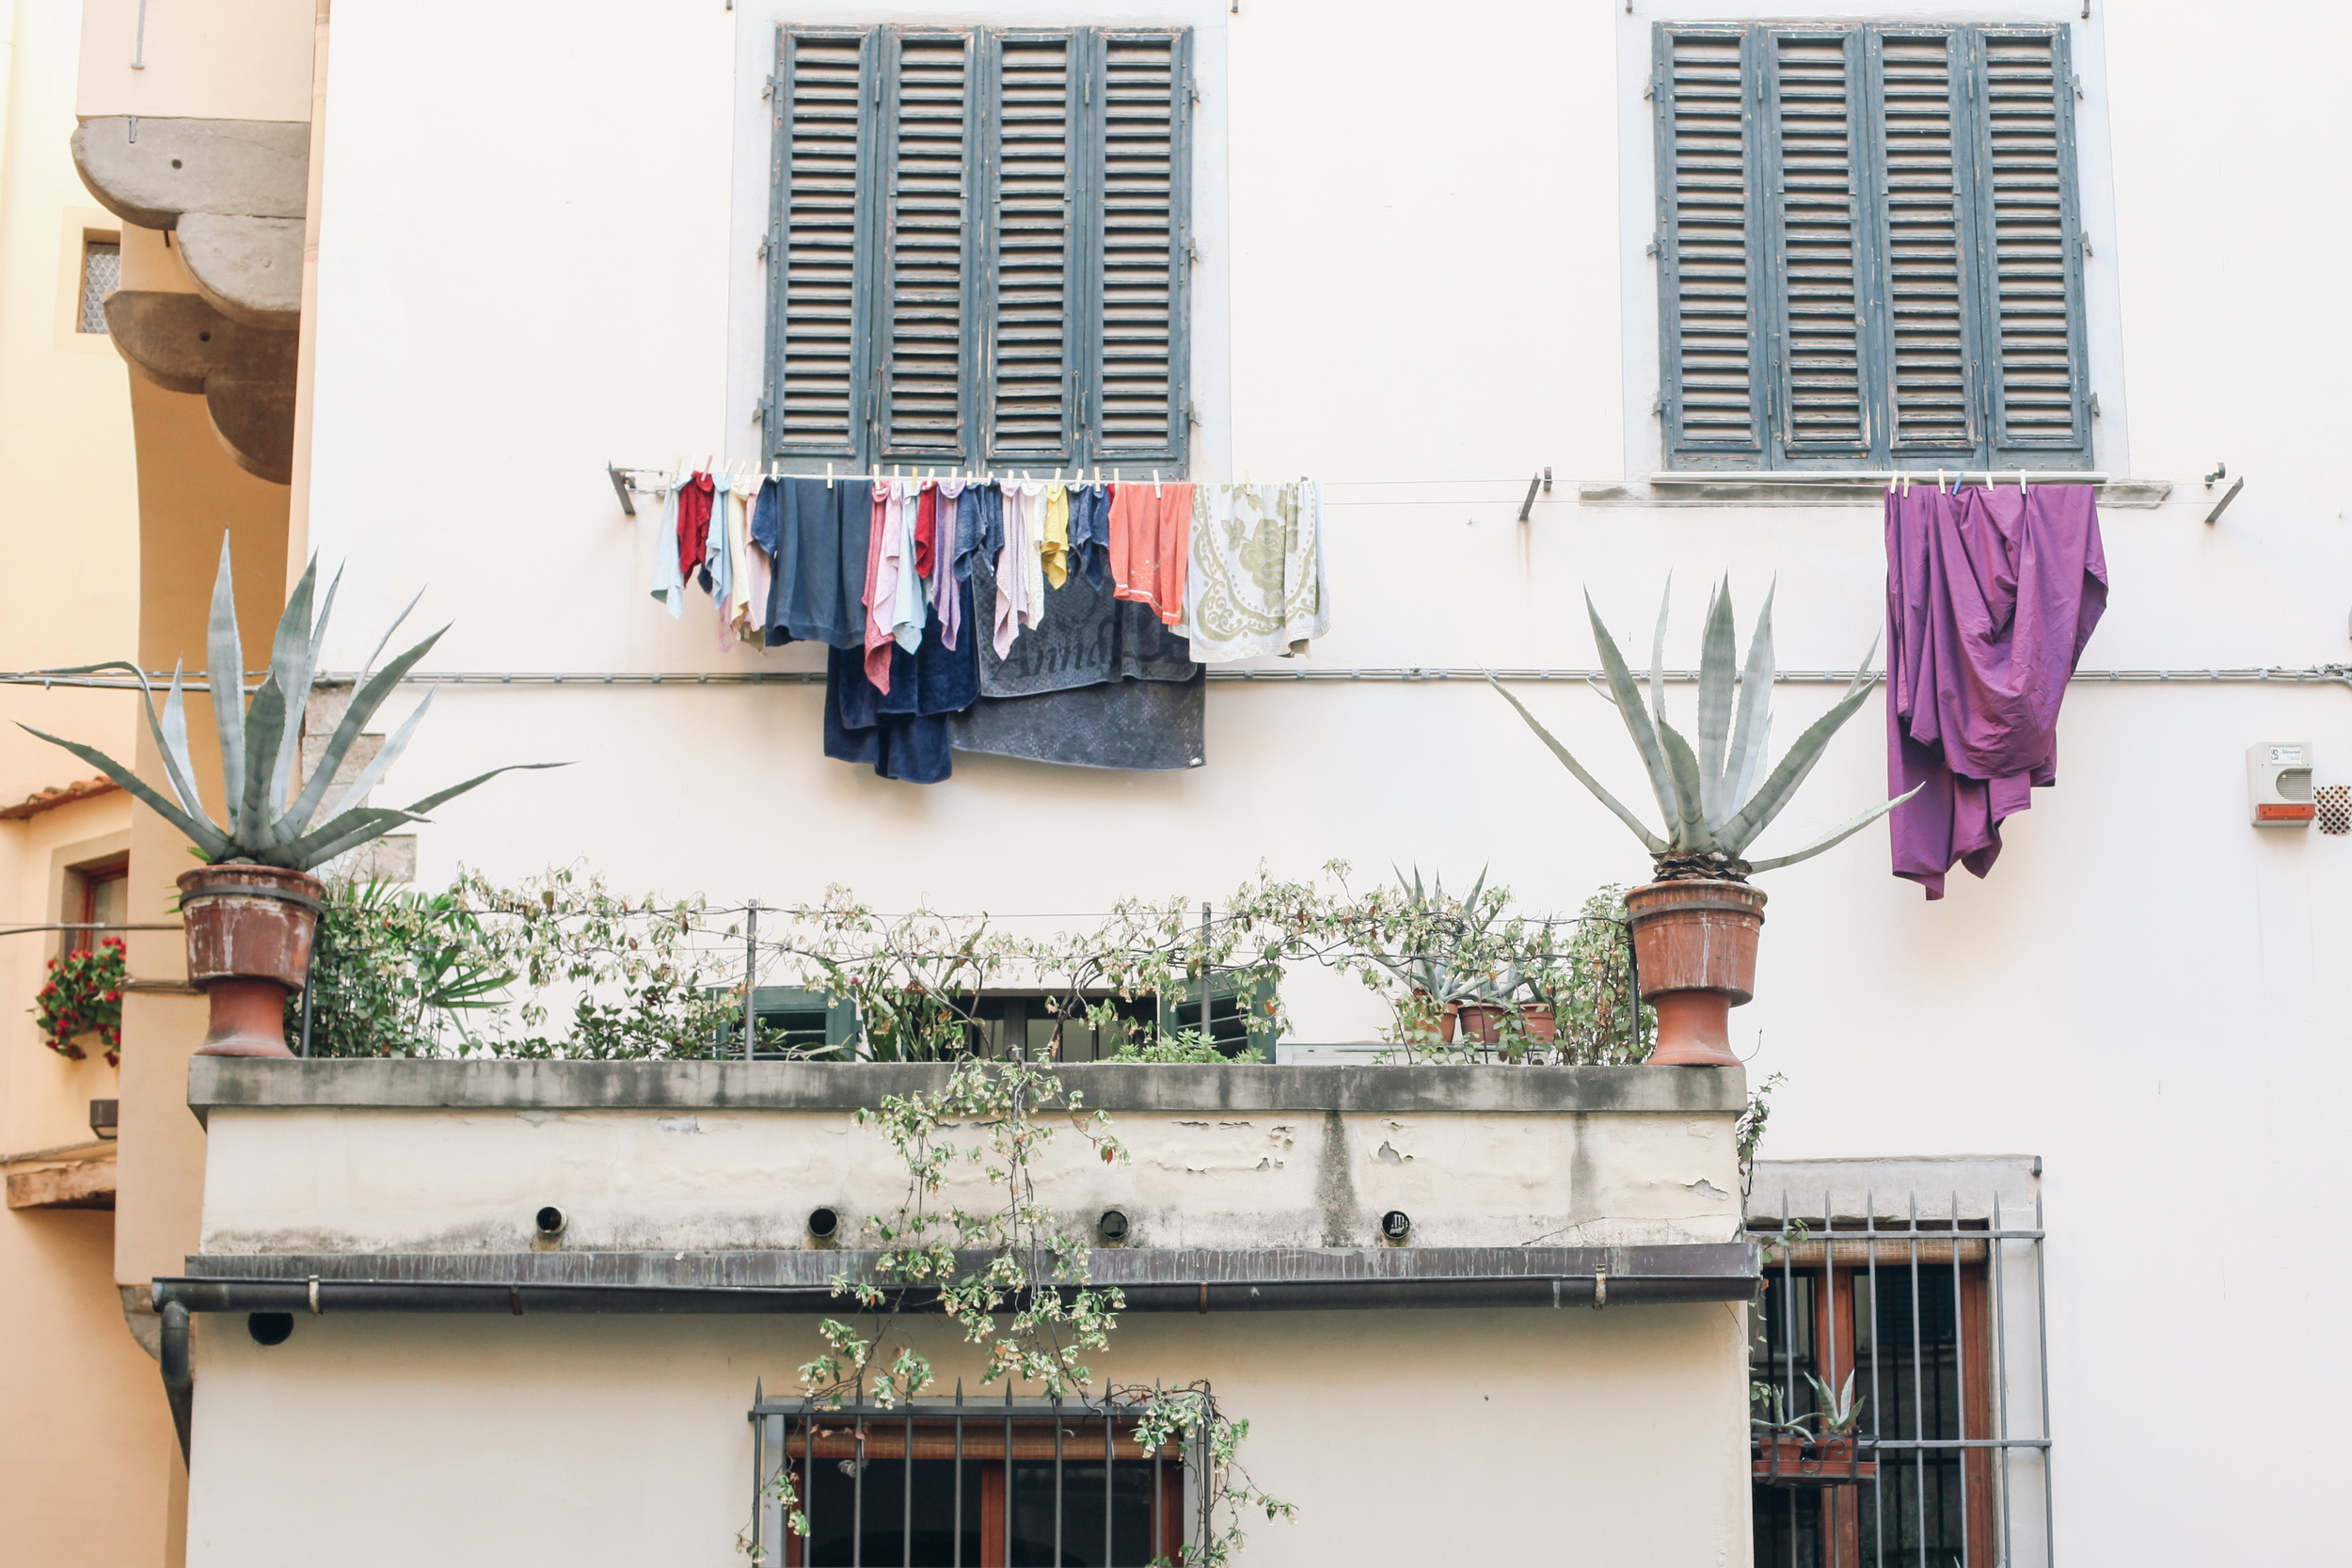 Italy2013-13.jpg